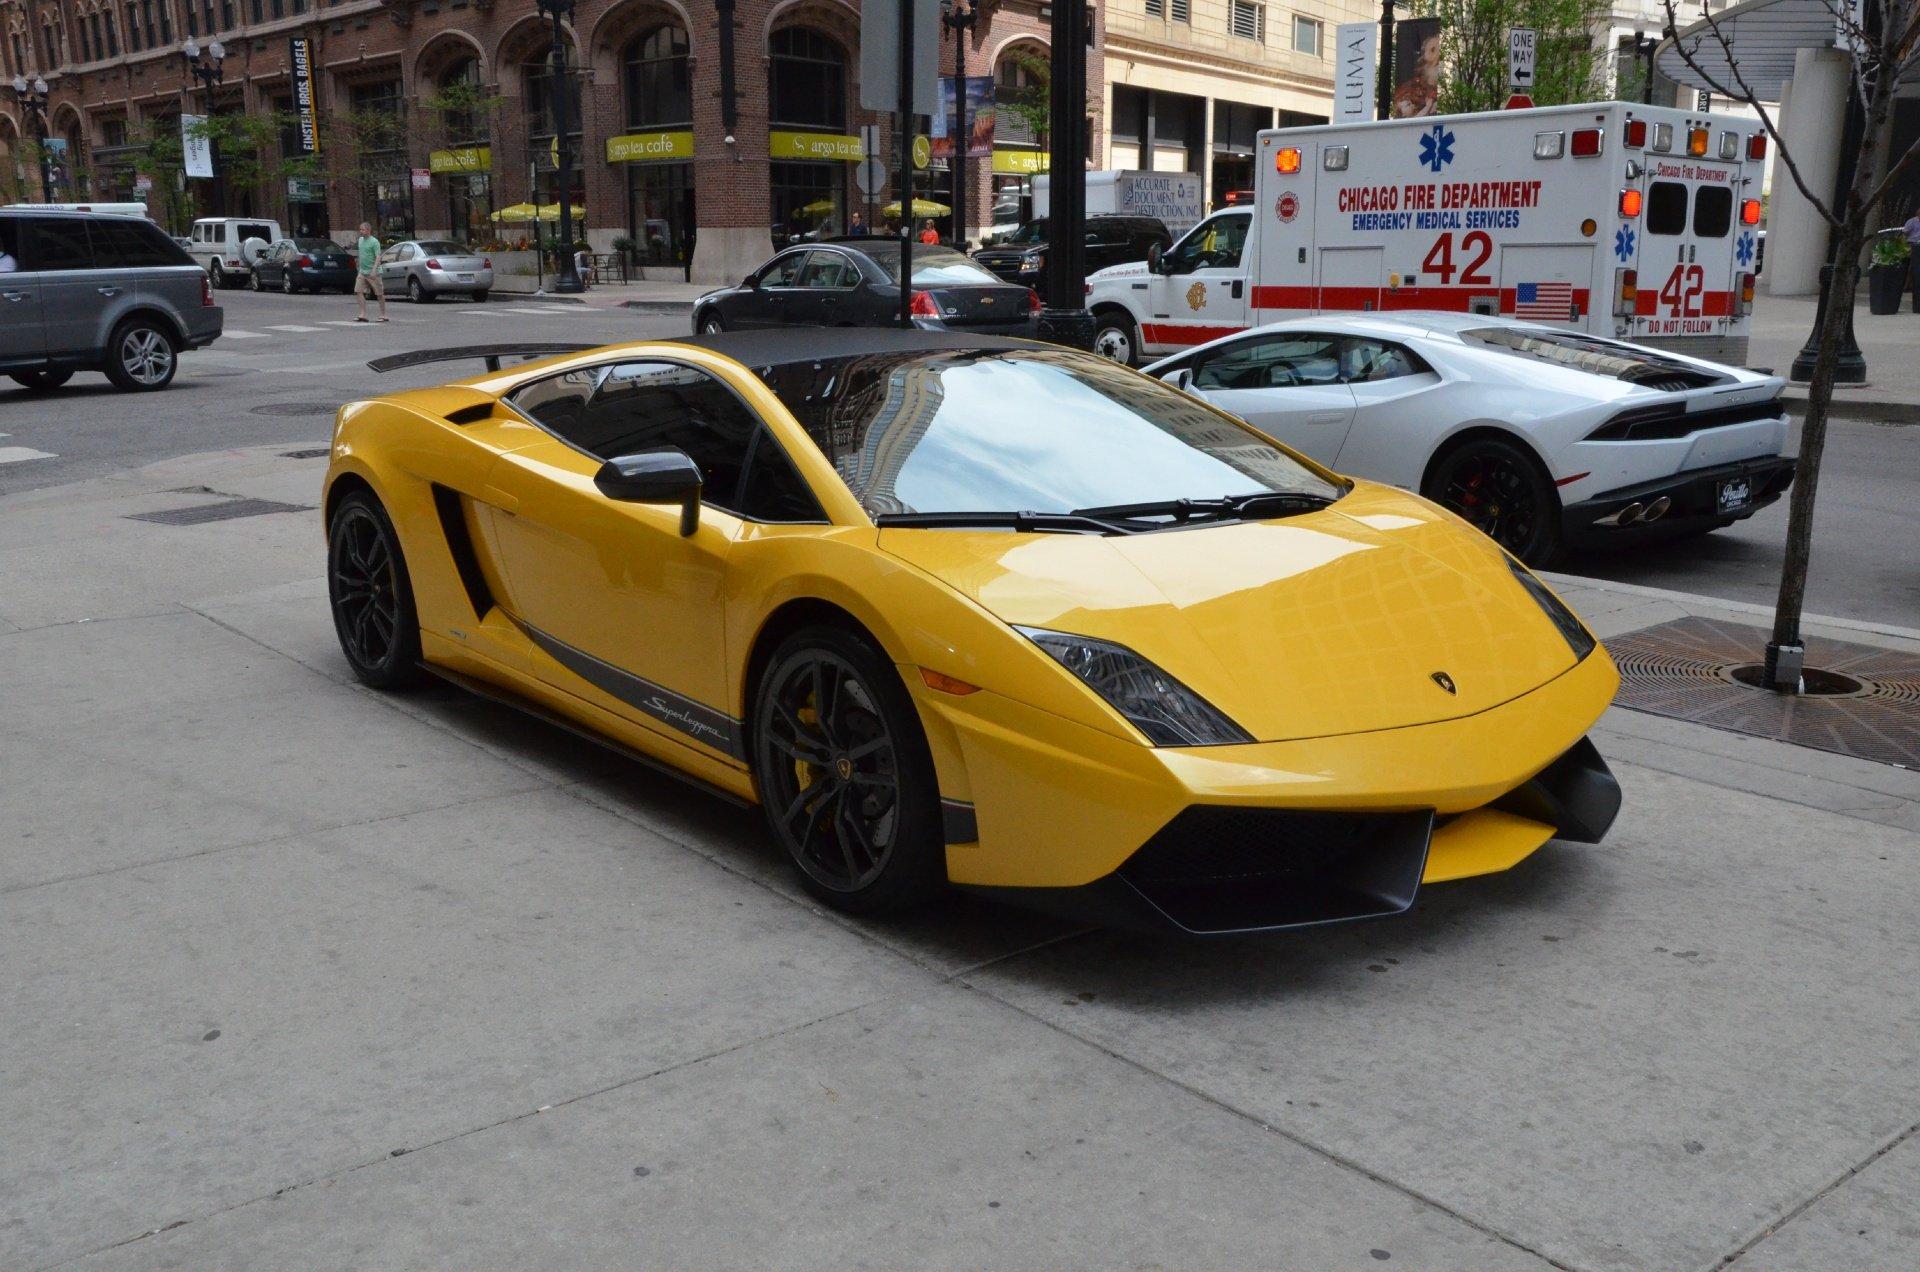 2011 lamborghini gallardo lp570 4 superleggera cars giallo midas yellow wallpaper 1920x1272 759906 wallpaperup